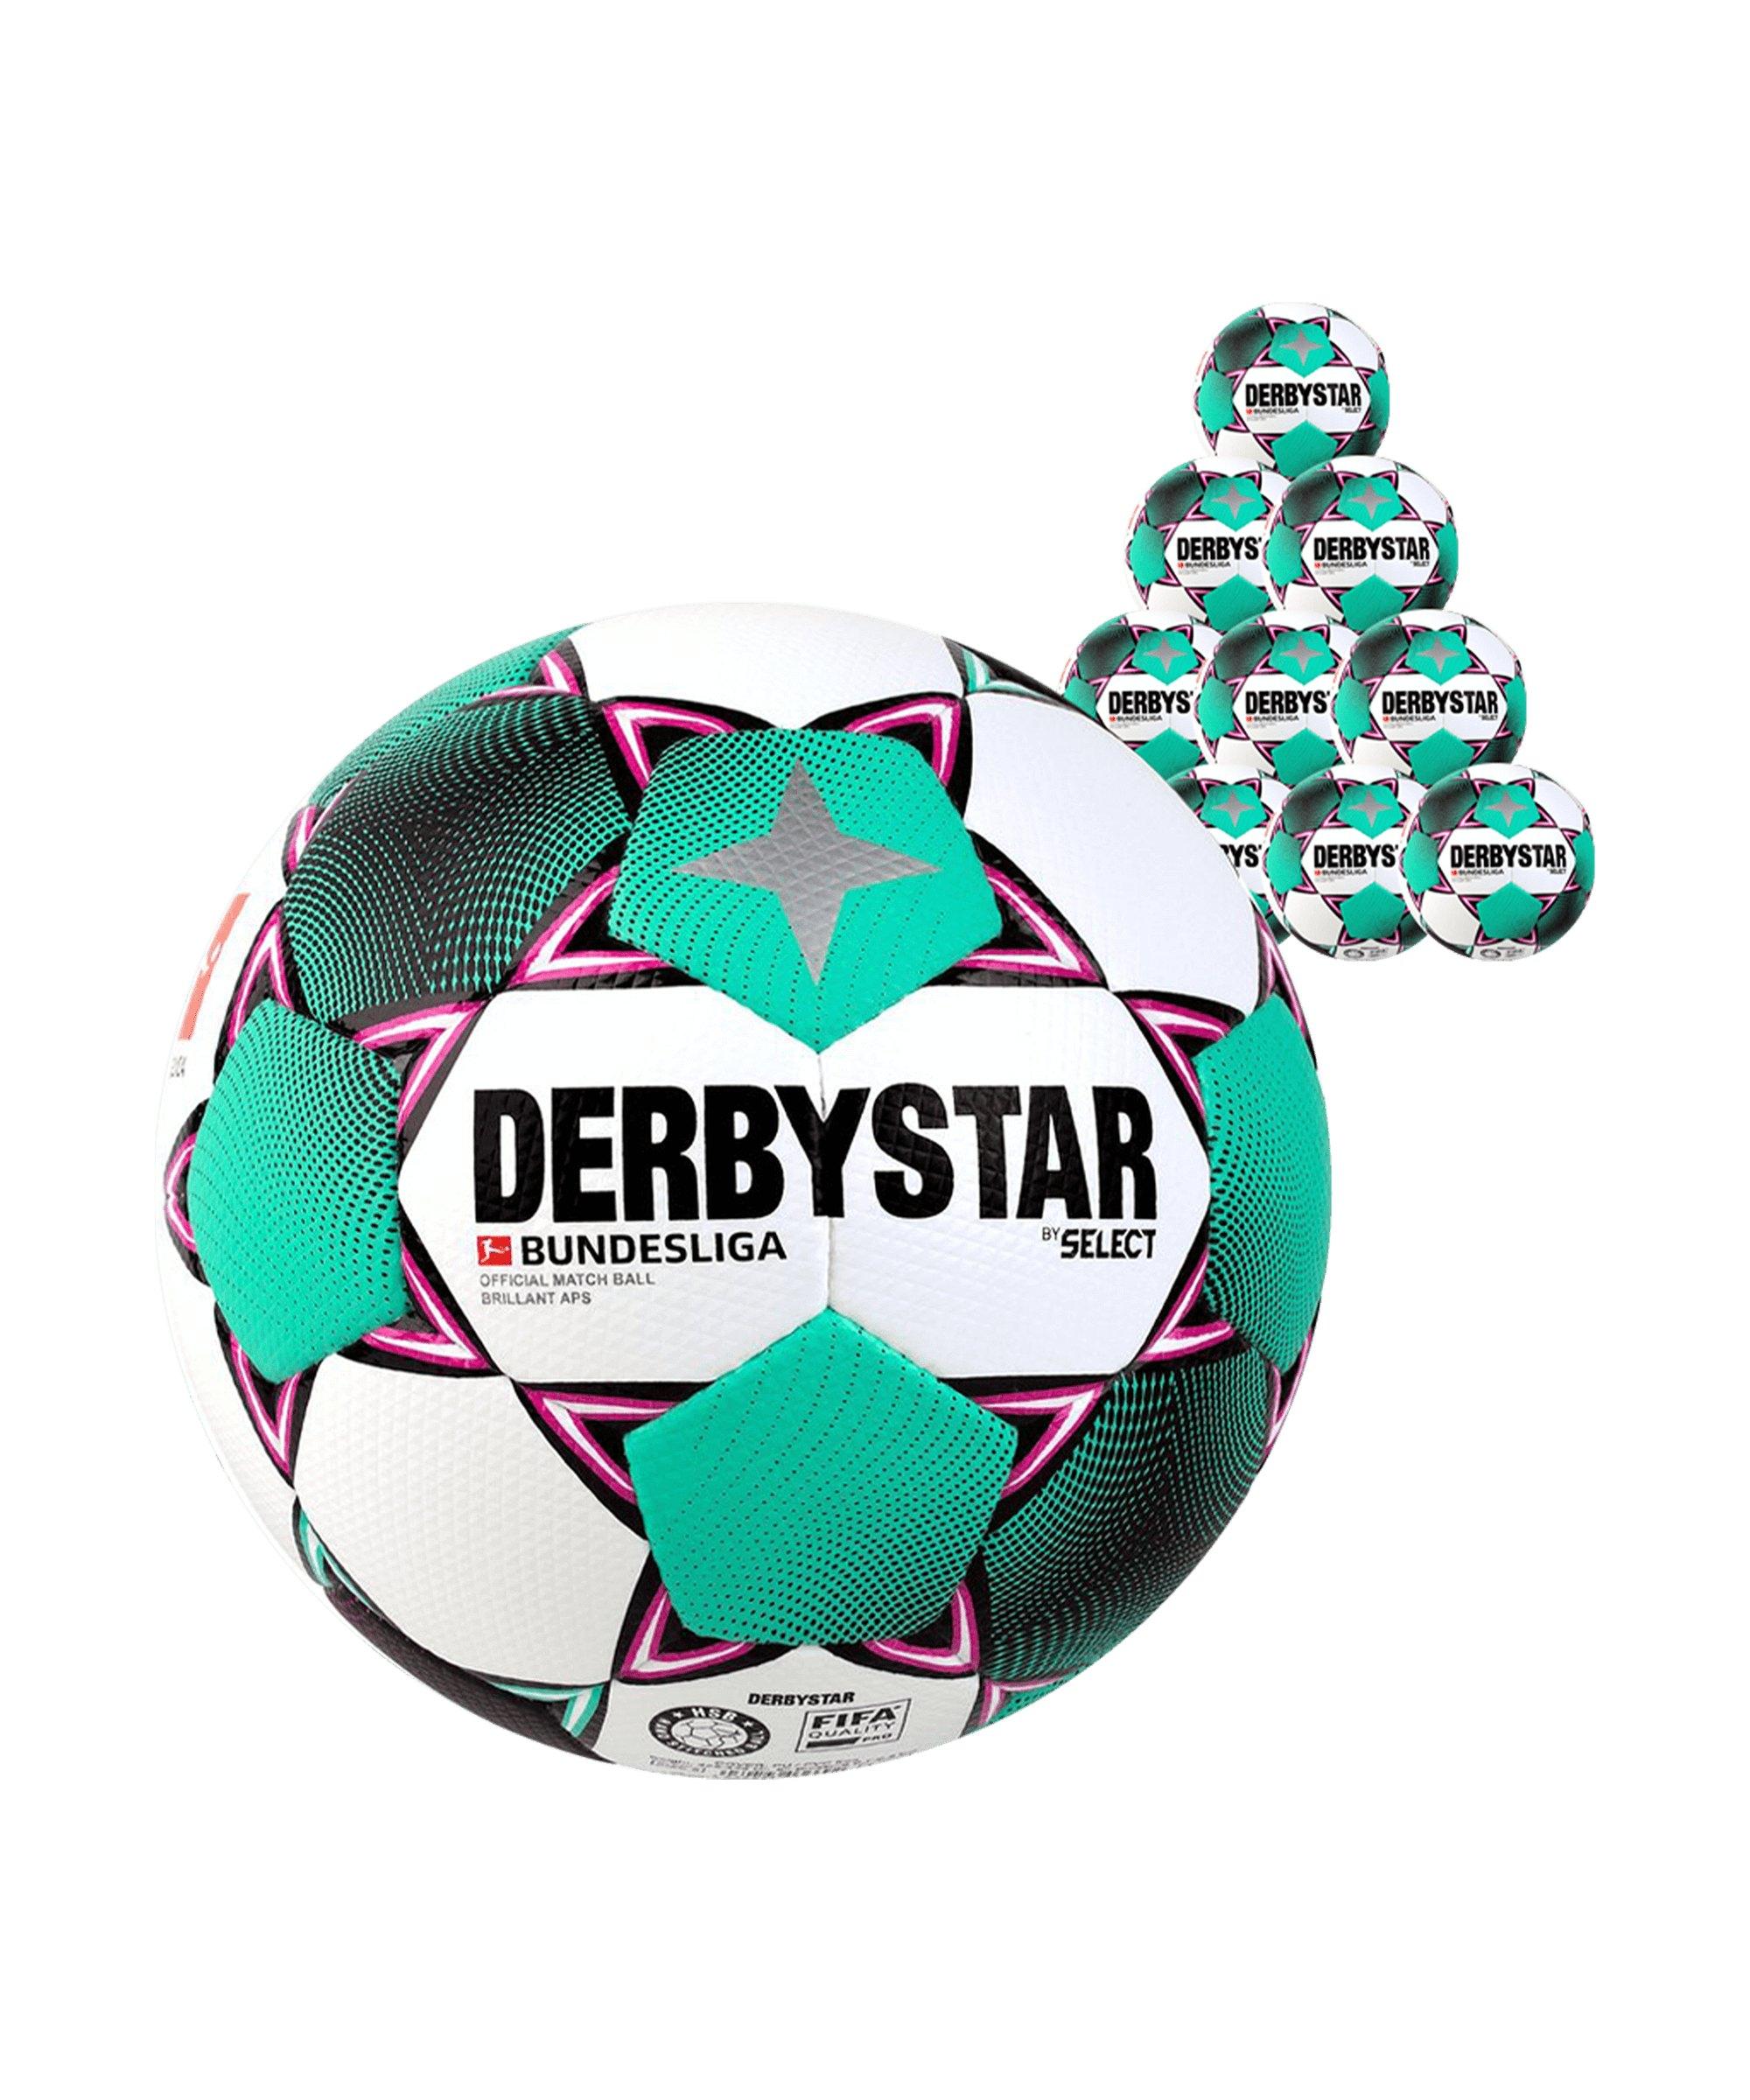 Derbystar Bundesliga Brillant APS x10 Spielball Weiss F020 - weiss